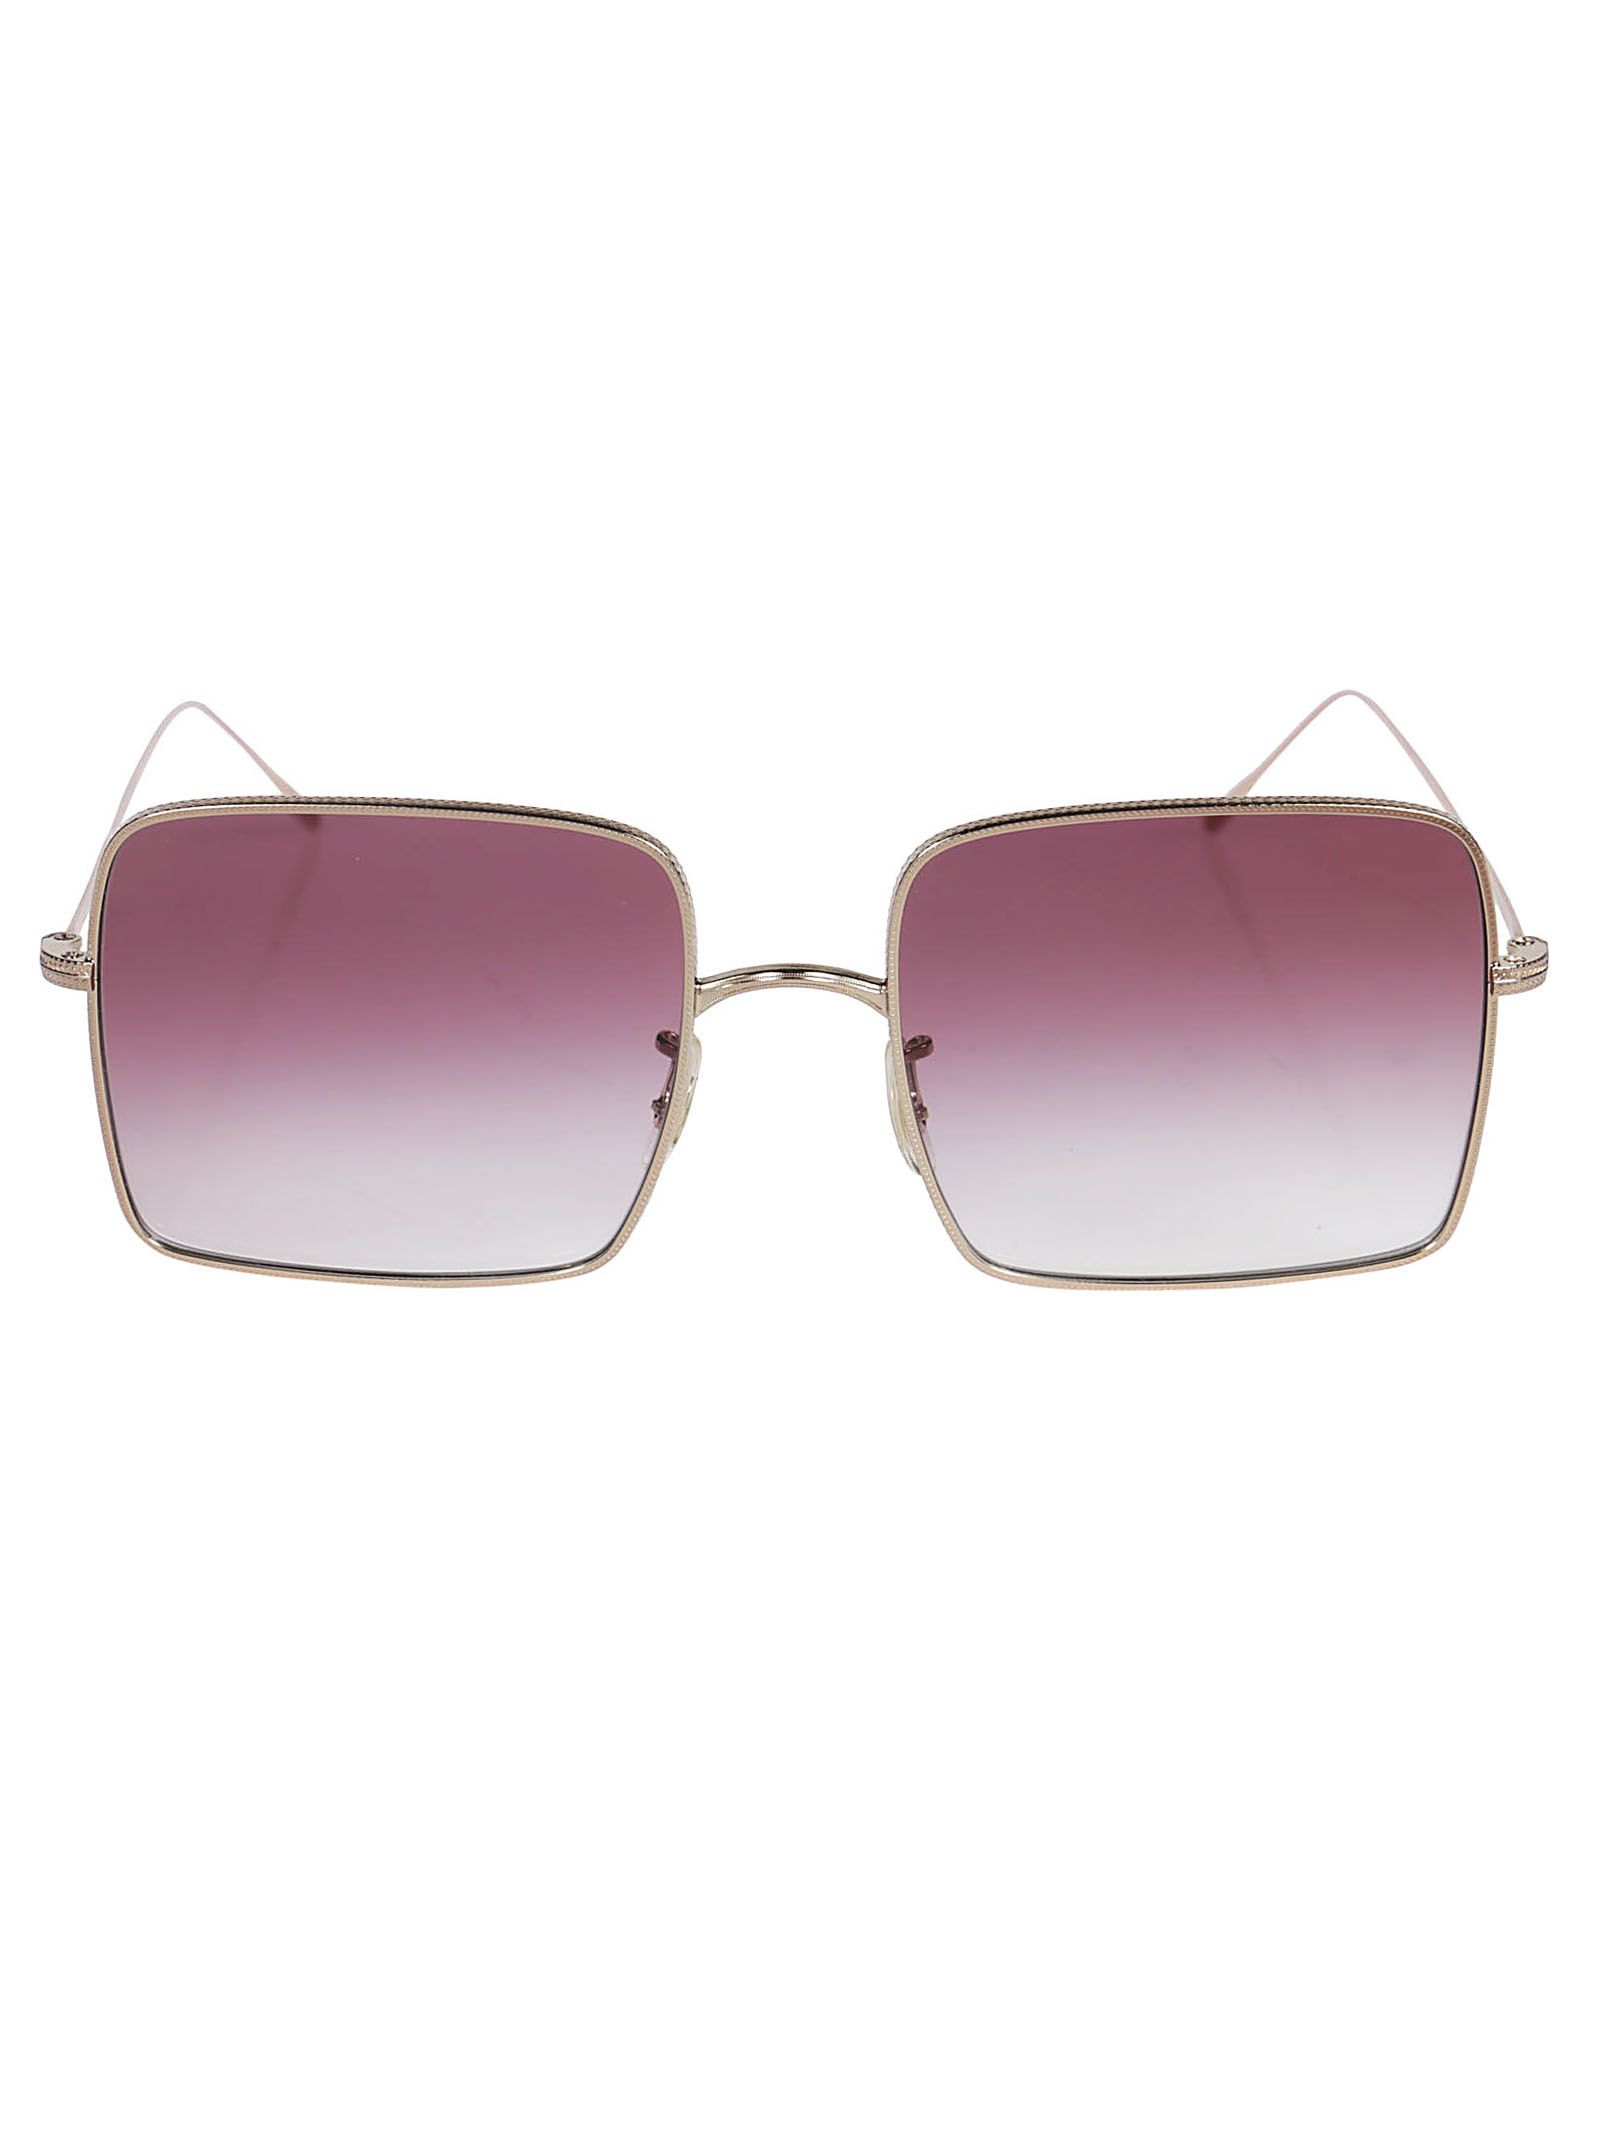 Oliver Peoples Rassine Sunglasses